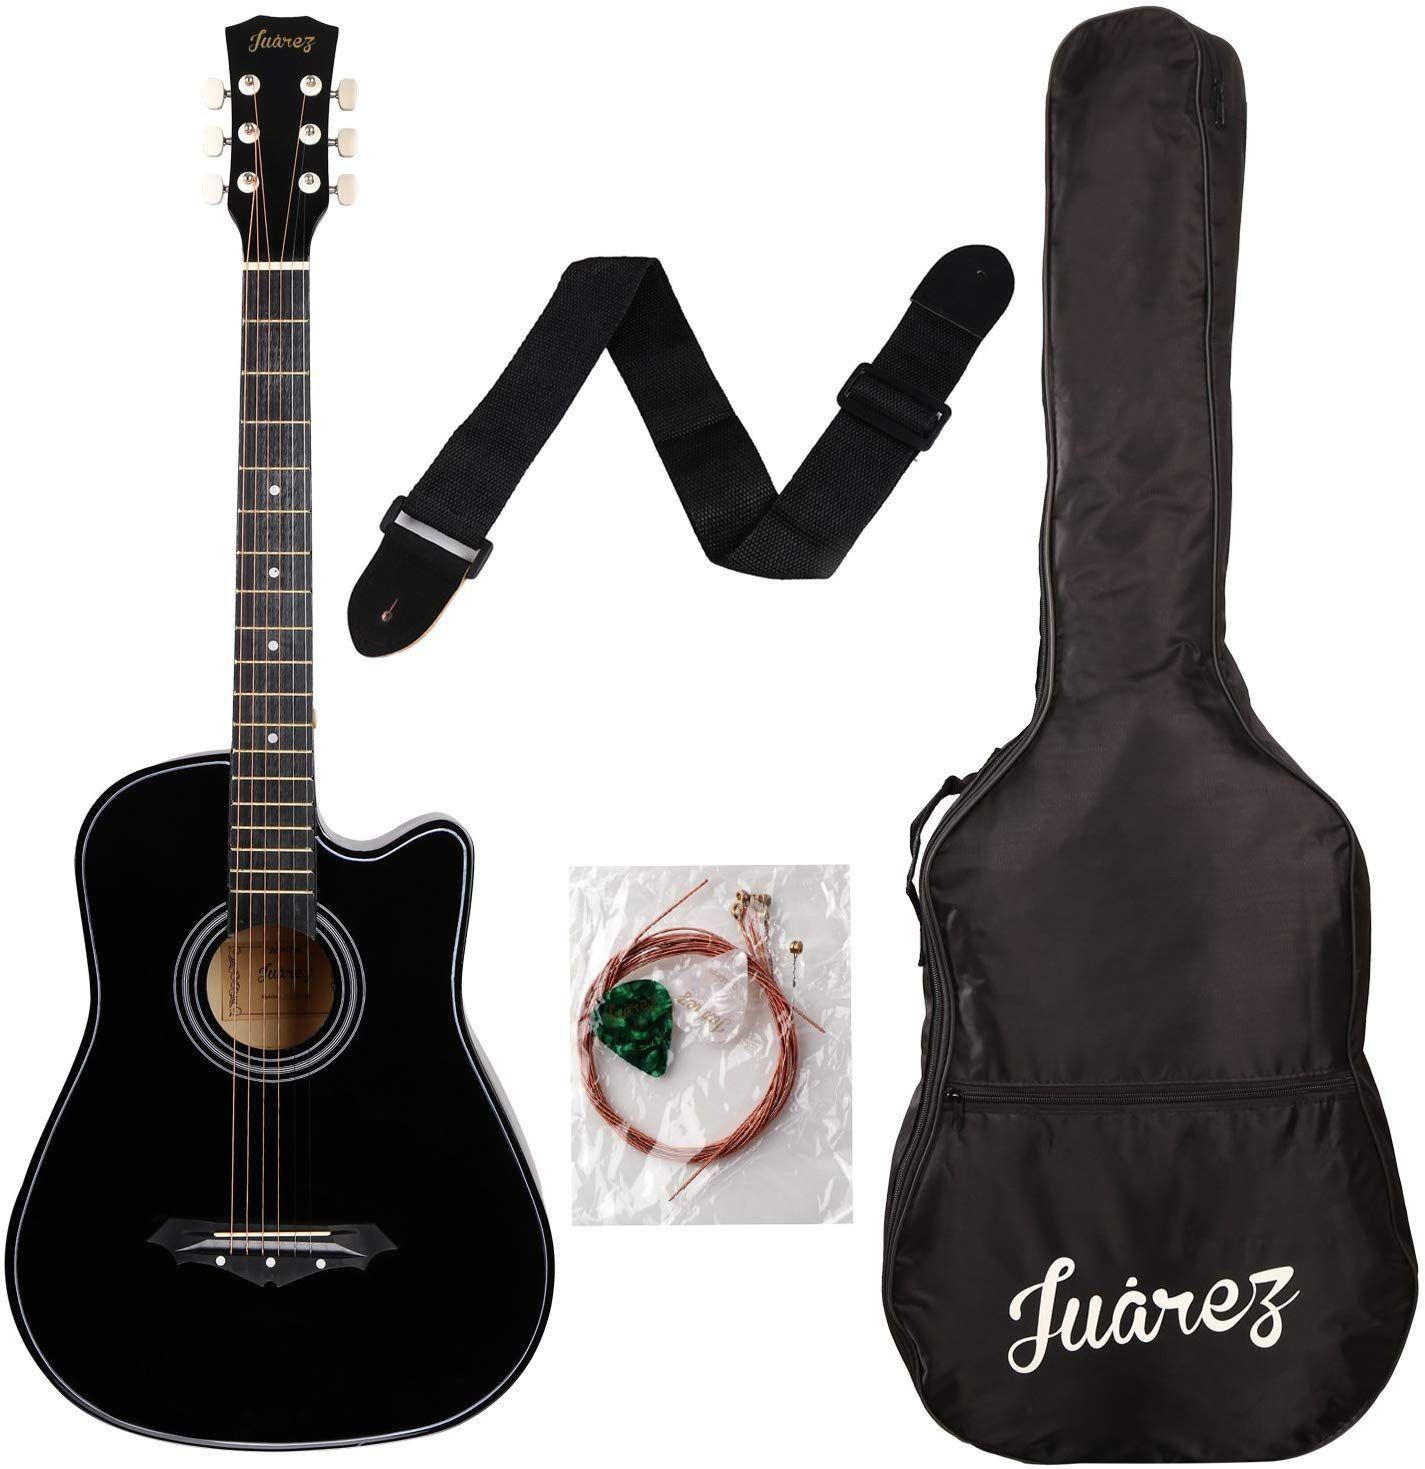 Juarez Acoustic Guitar 38 Inch Cutaway 038c With Bag Strings Pick And Strap Black Acoustic Guitar Kits Guitar For Beginners Best Acoustic Guitar